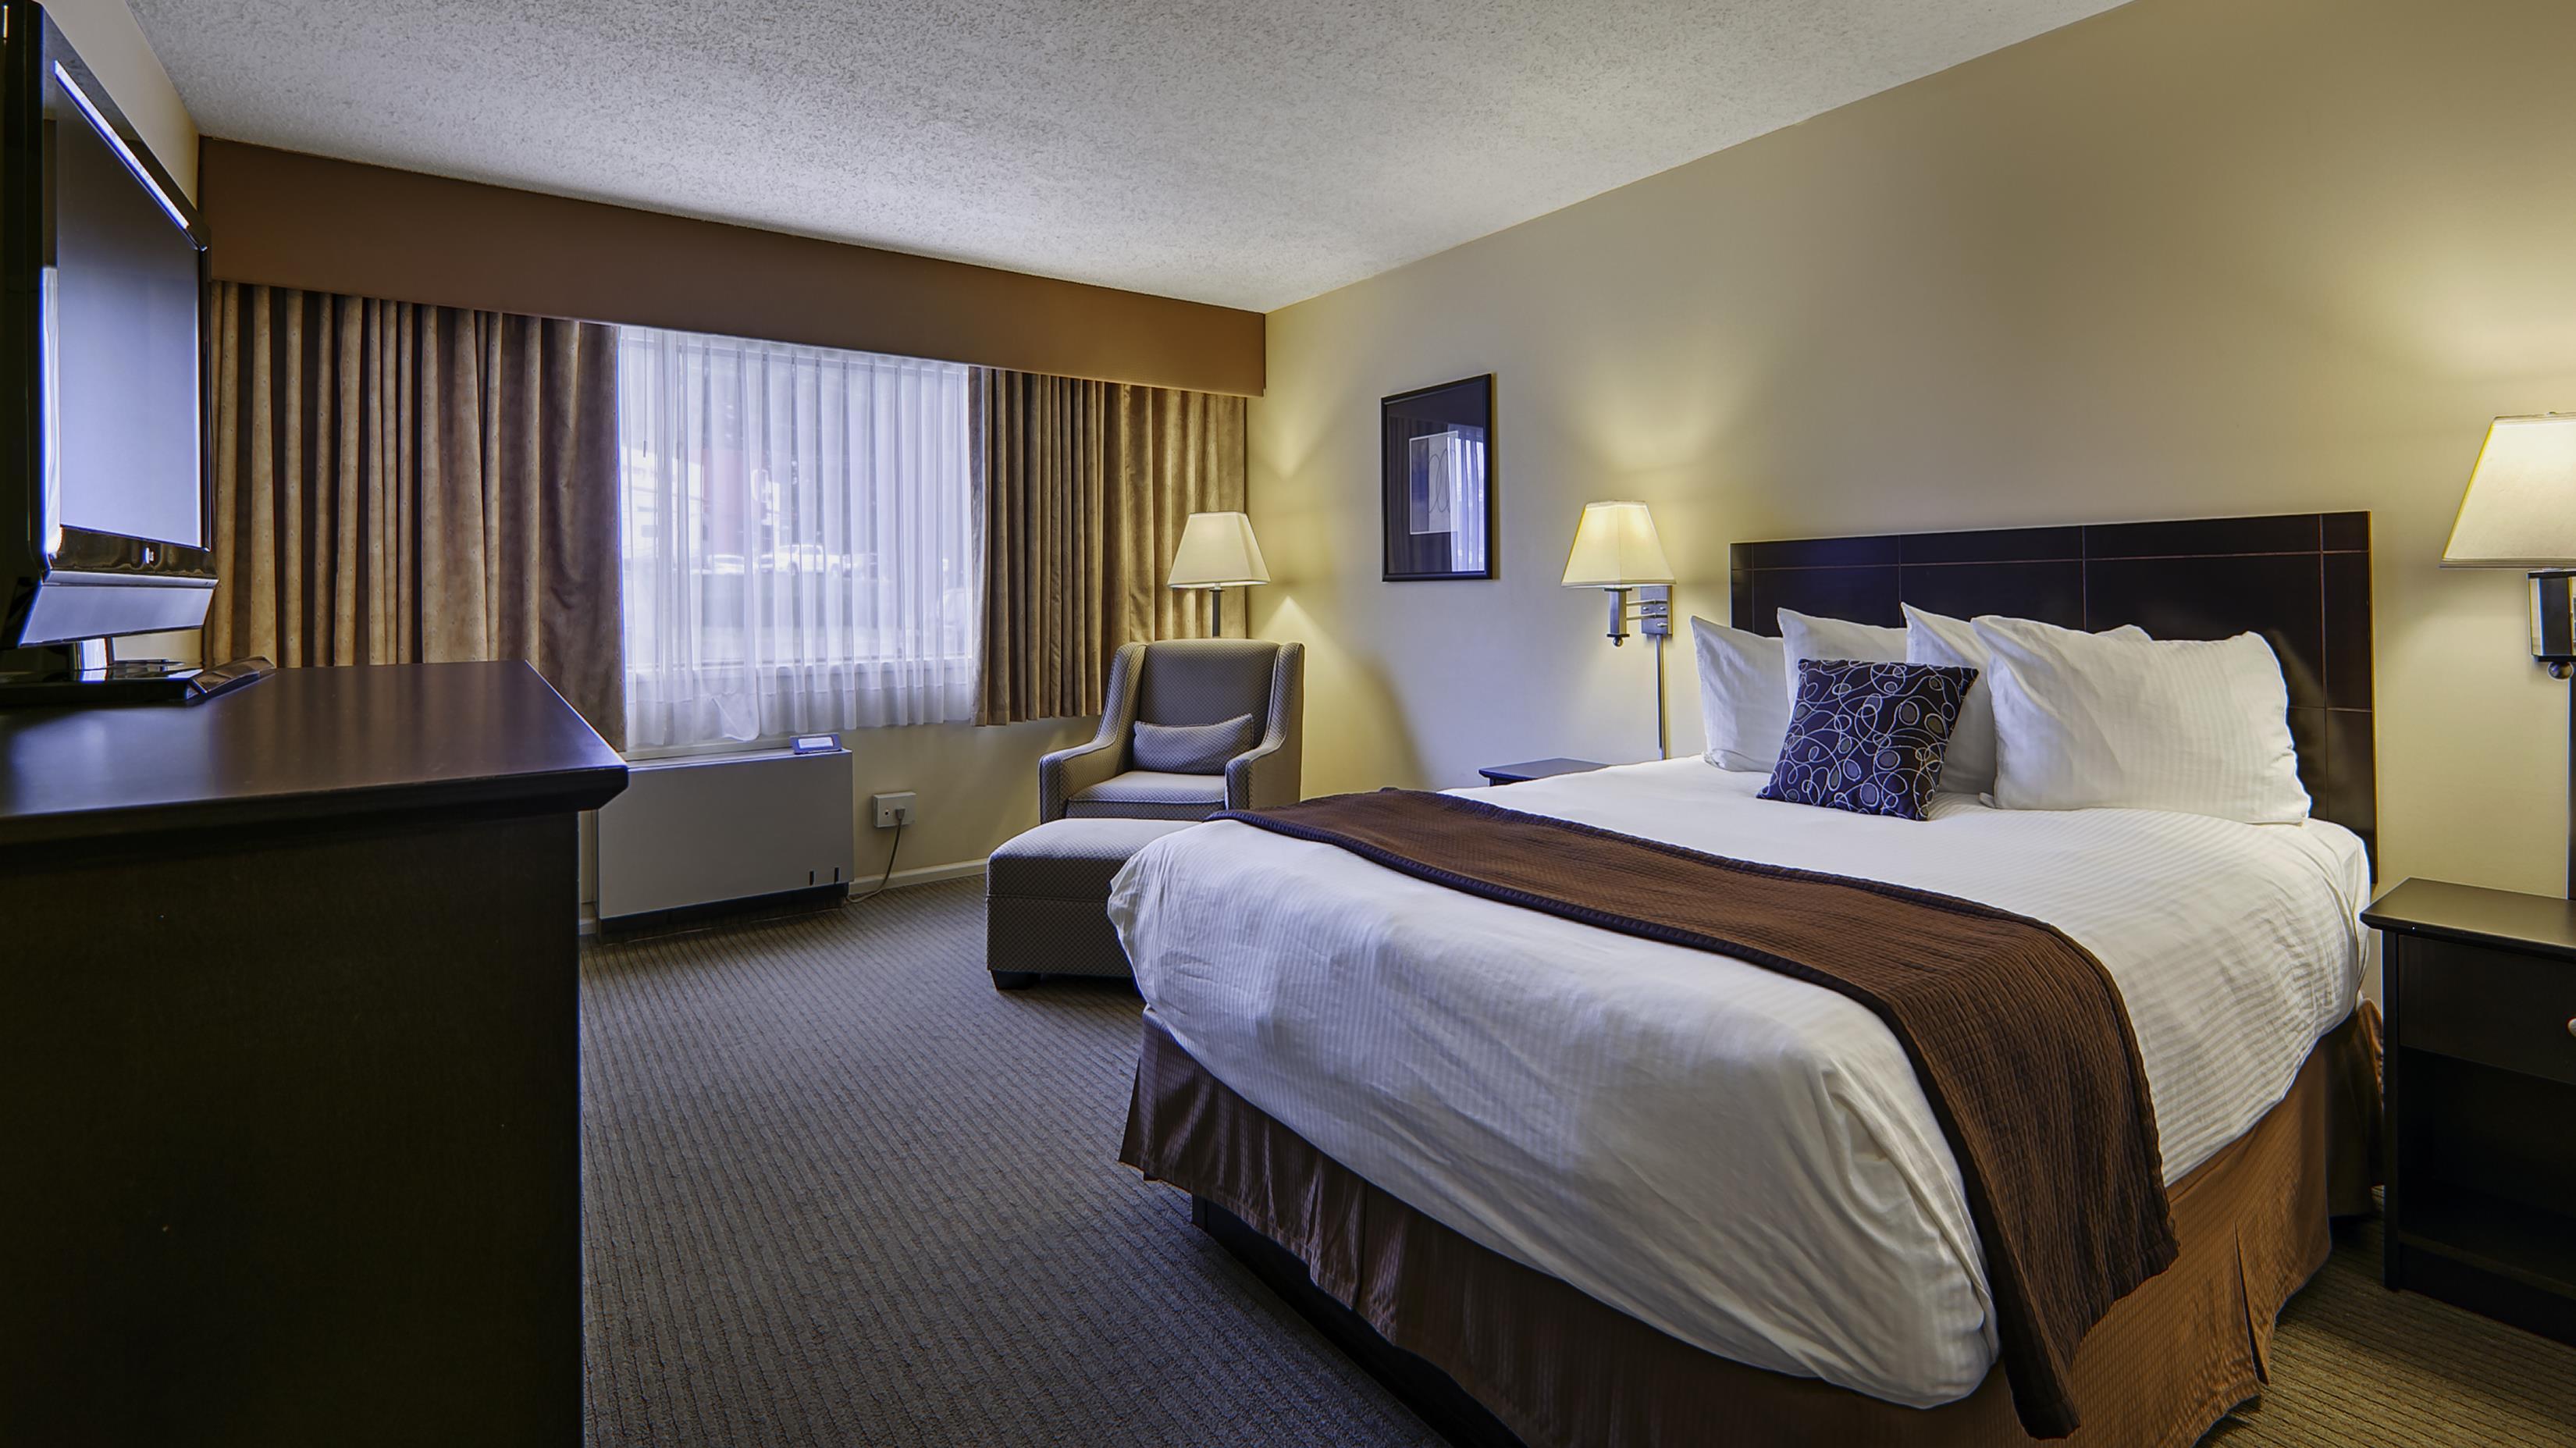 Best Western Cowichan Valley Inn in Duncan: 2 Double Bed Guest Room